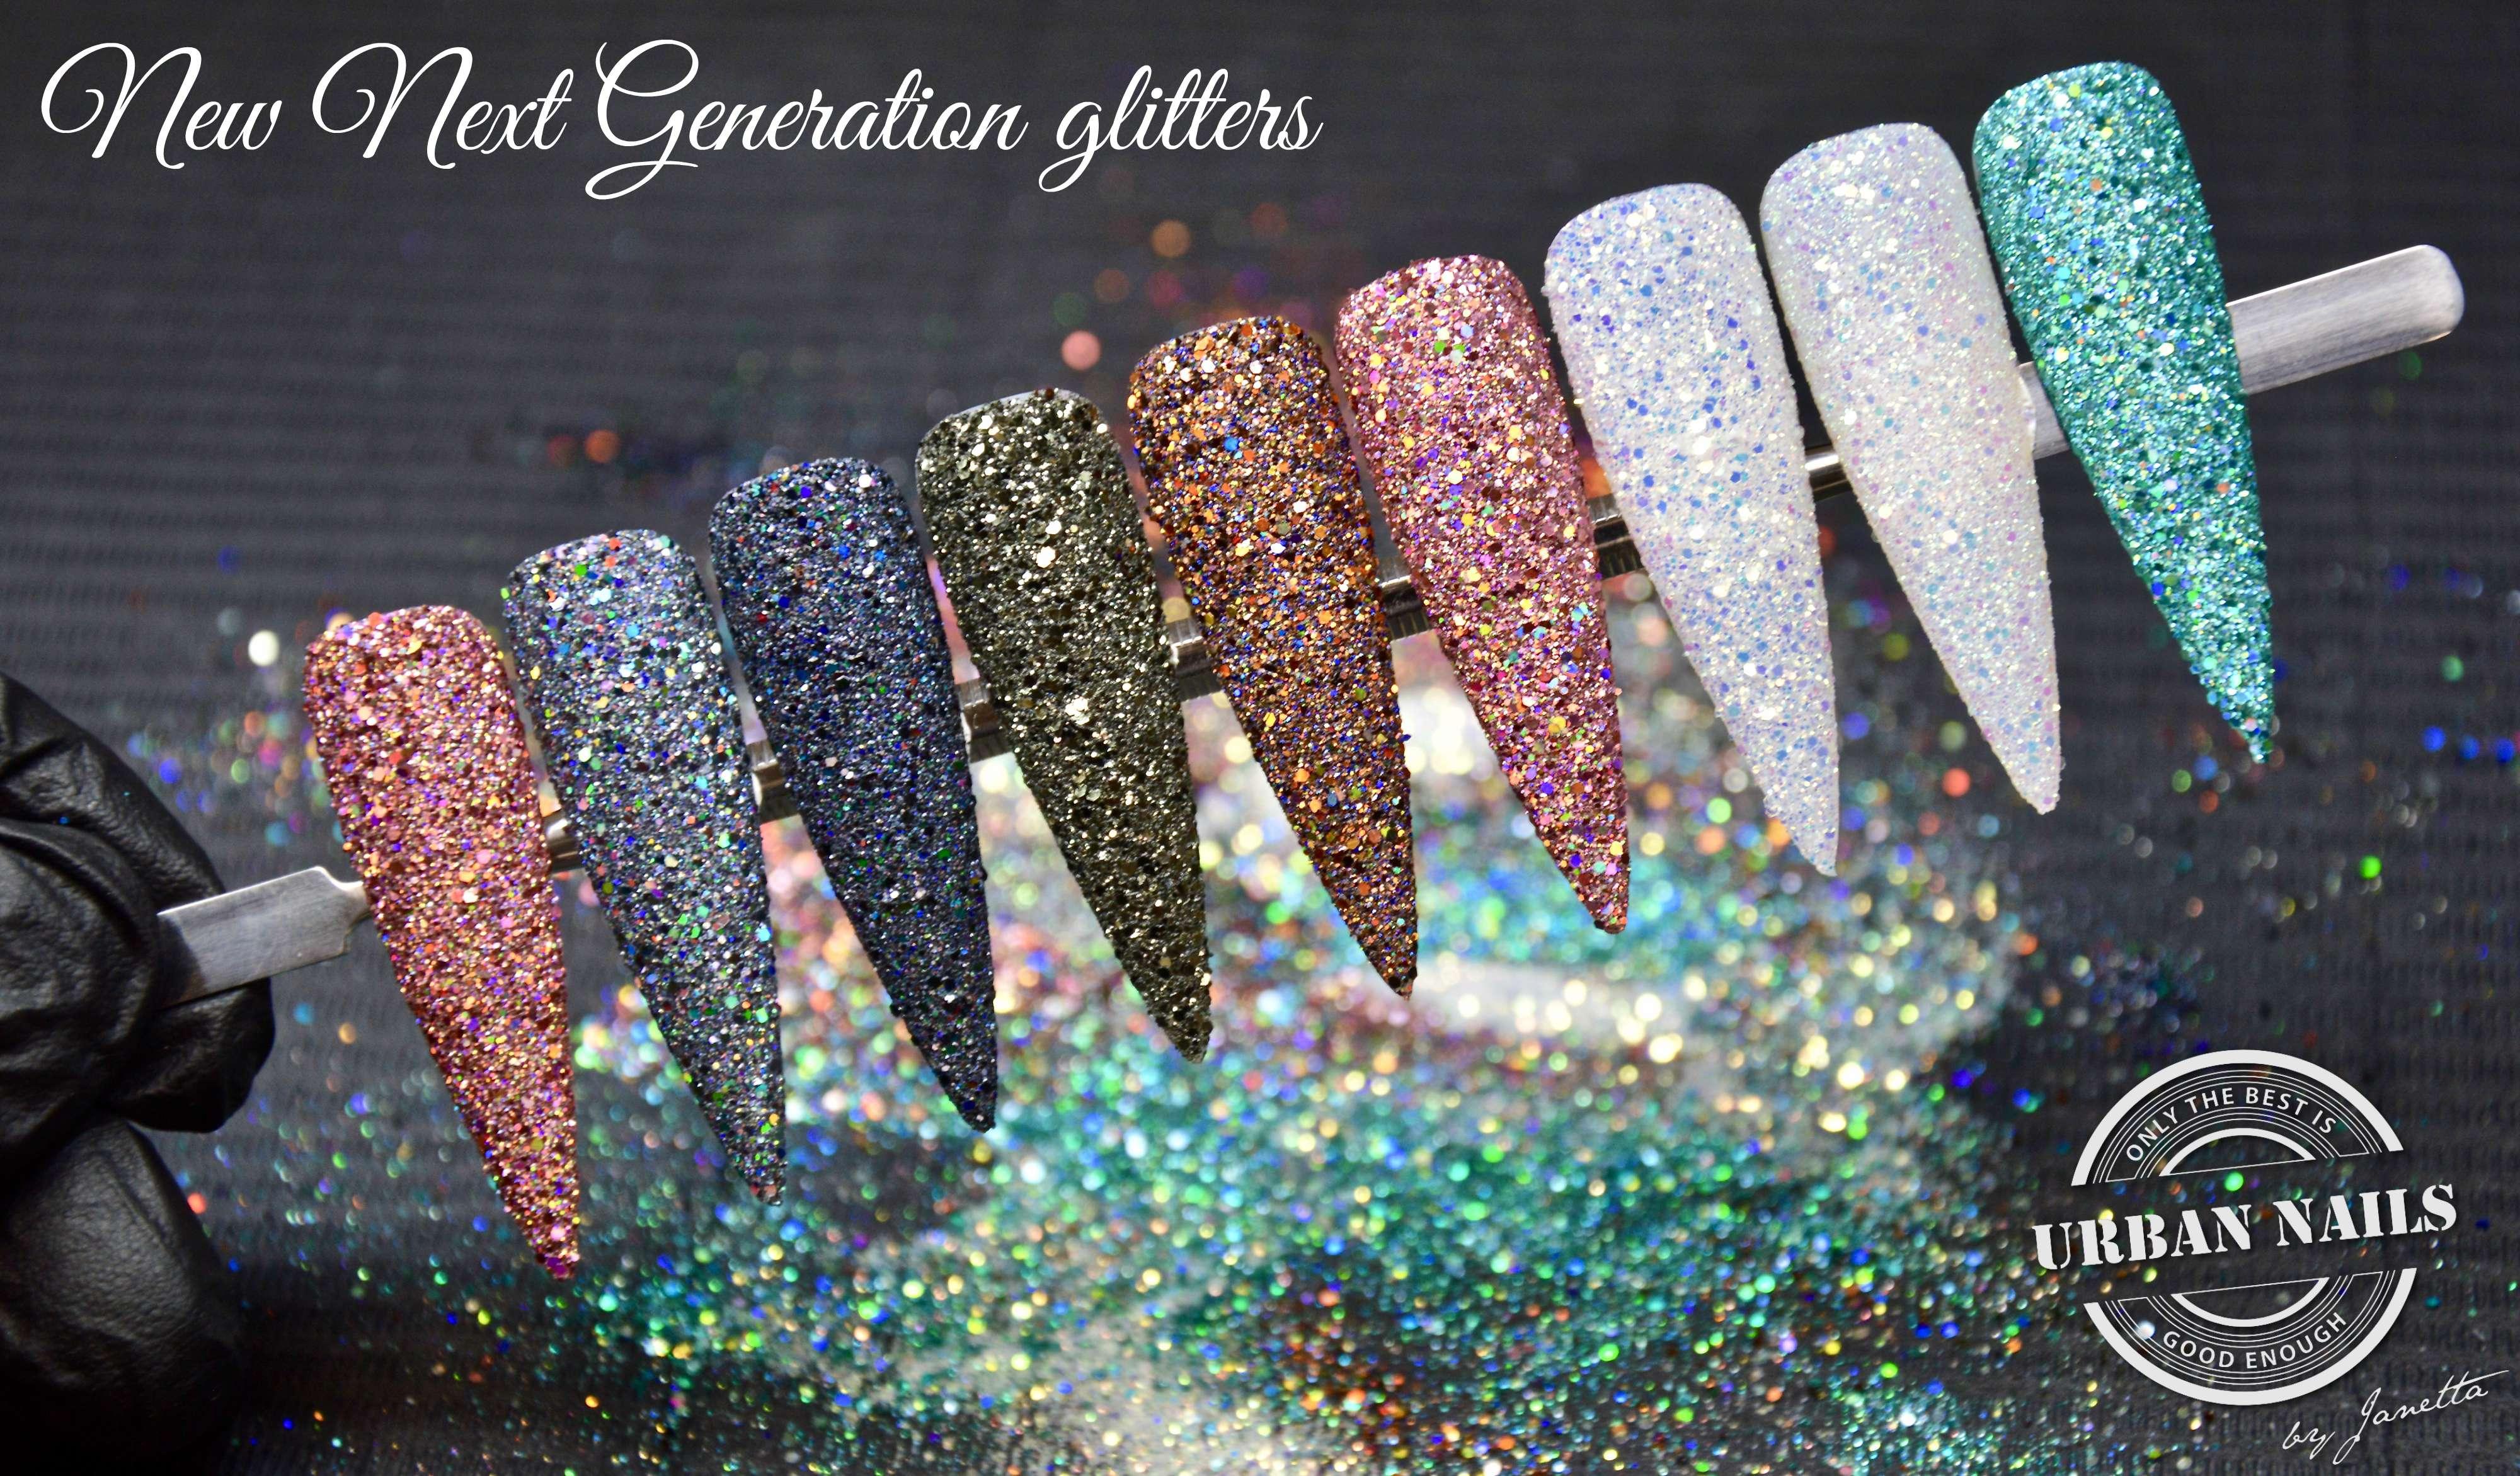 Next Generation Glitter